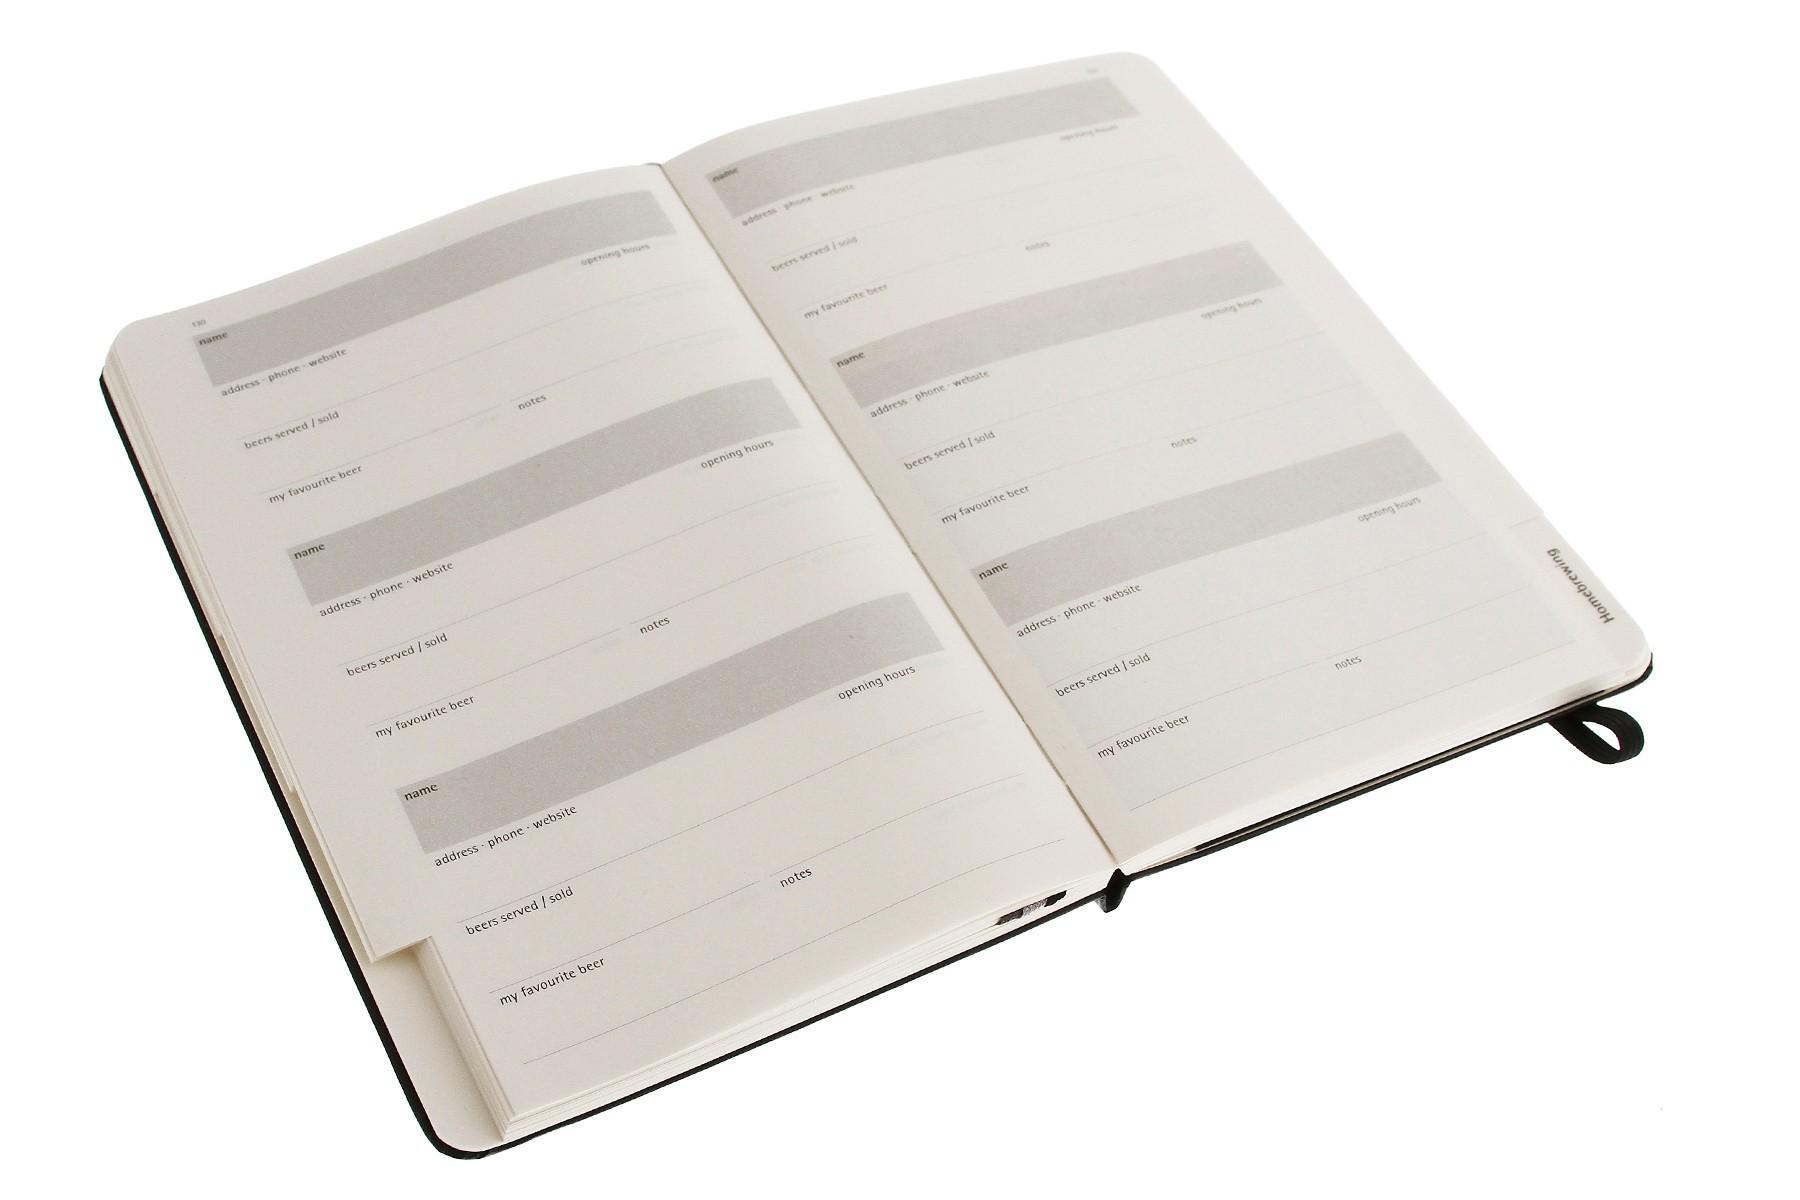 moleskine book journal template - moleskine beer journal muistikirjat vihkot ja